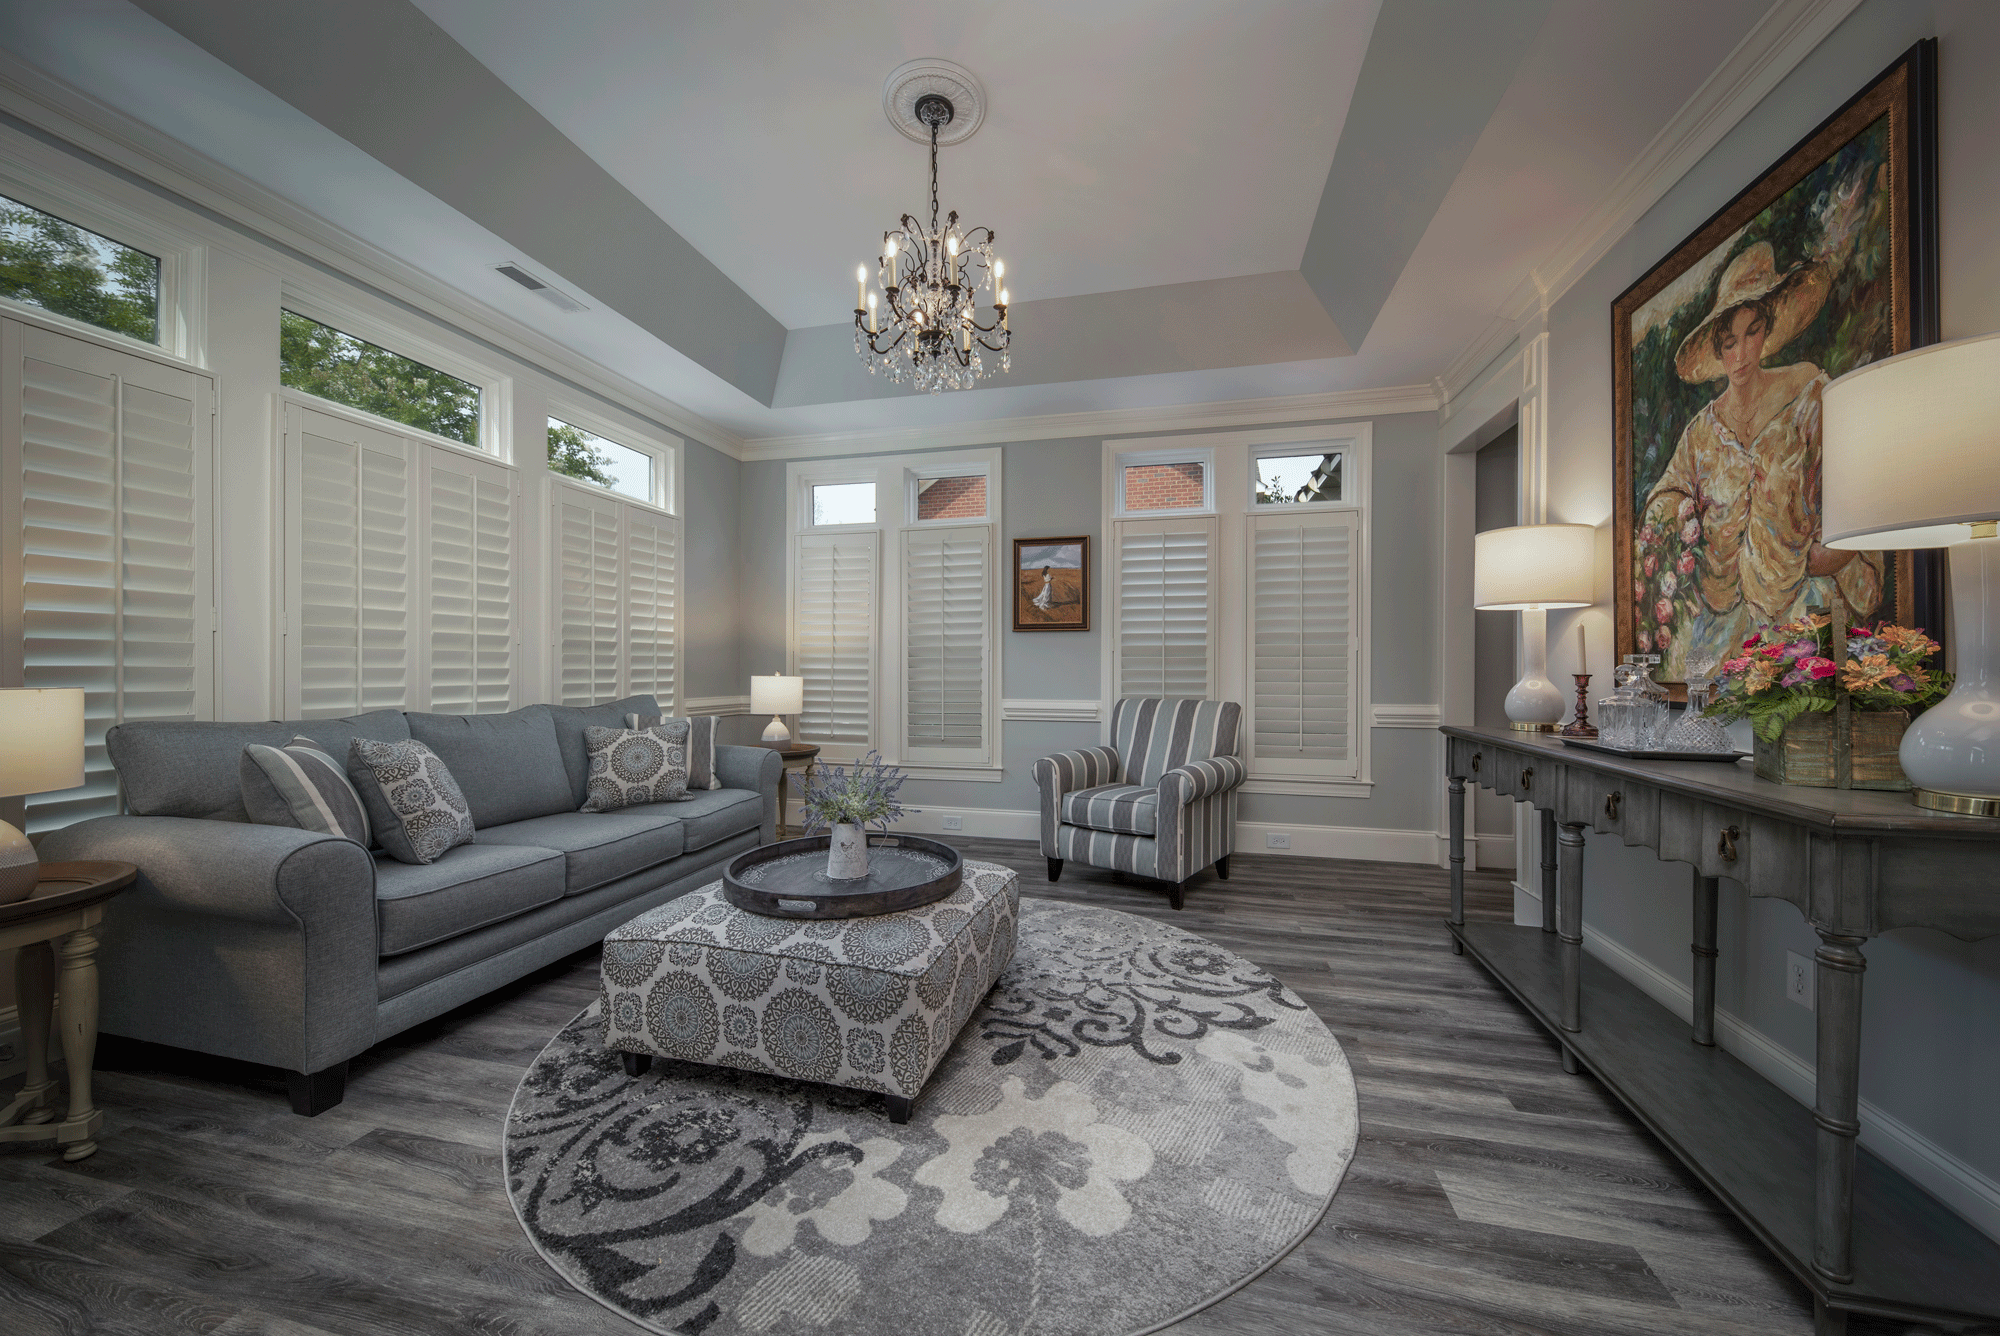 living room design with decor, seating, furniture, lighting, flooring, artwork